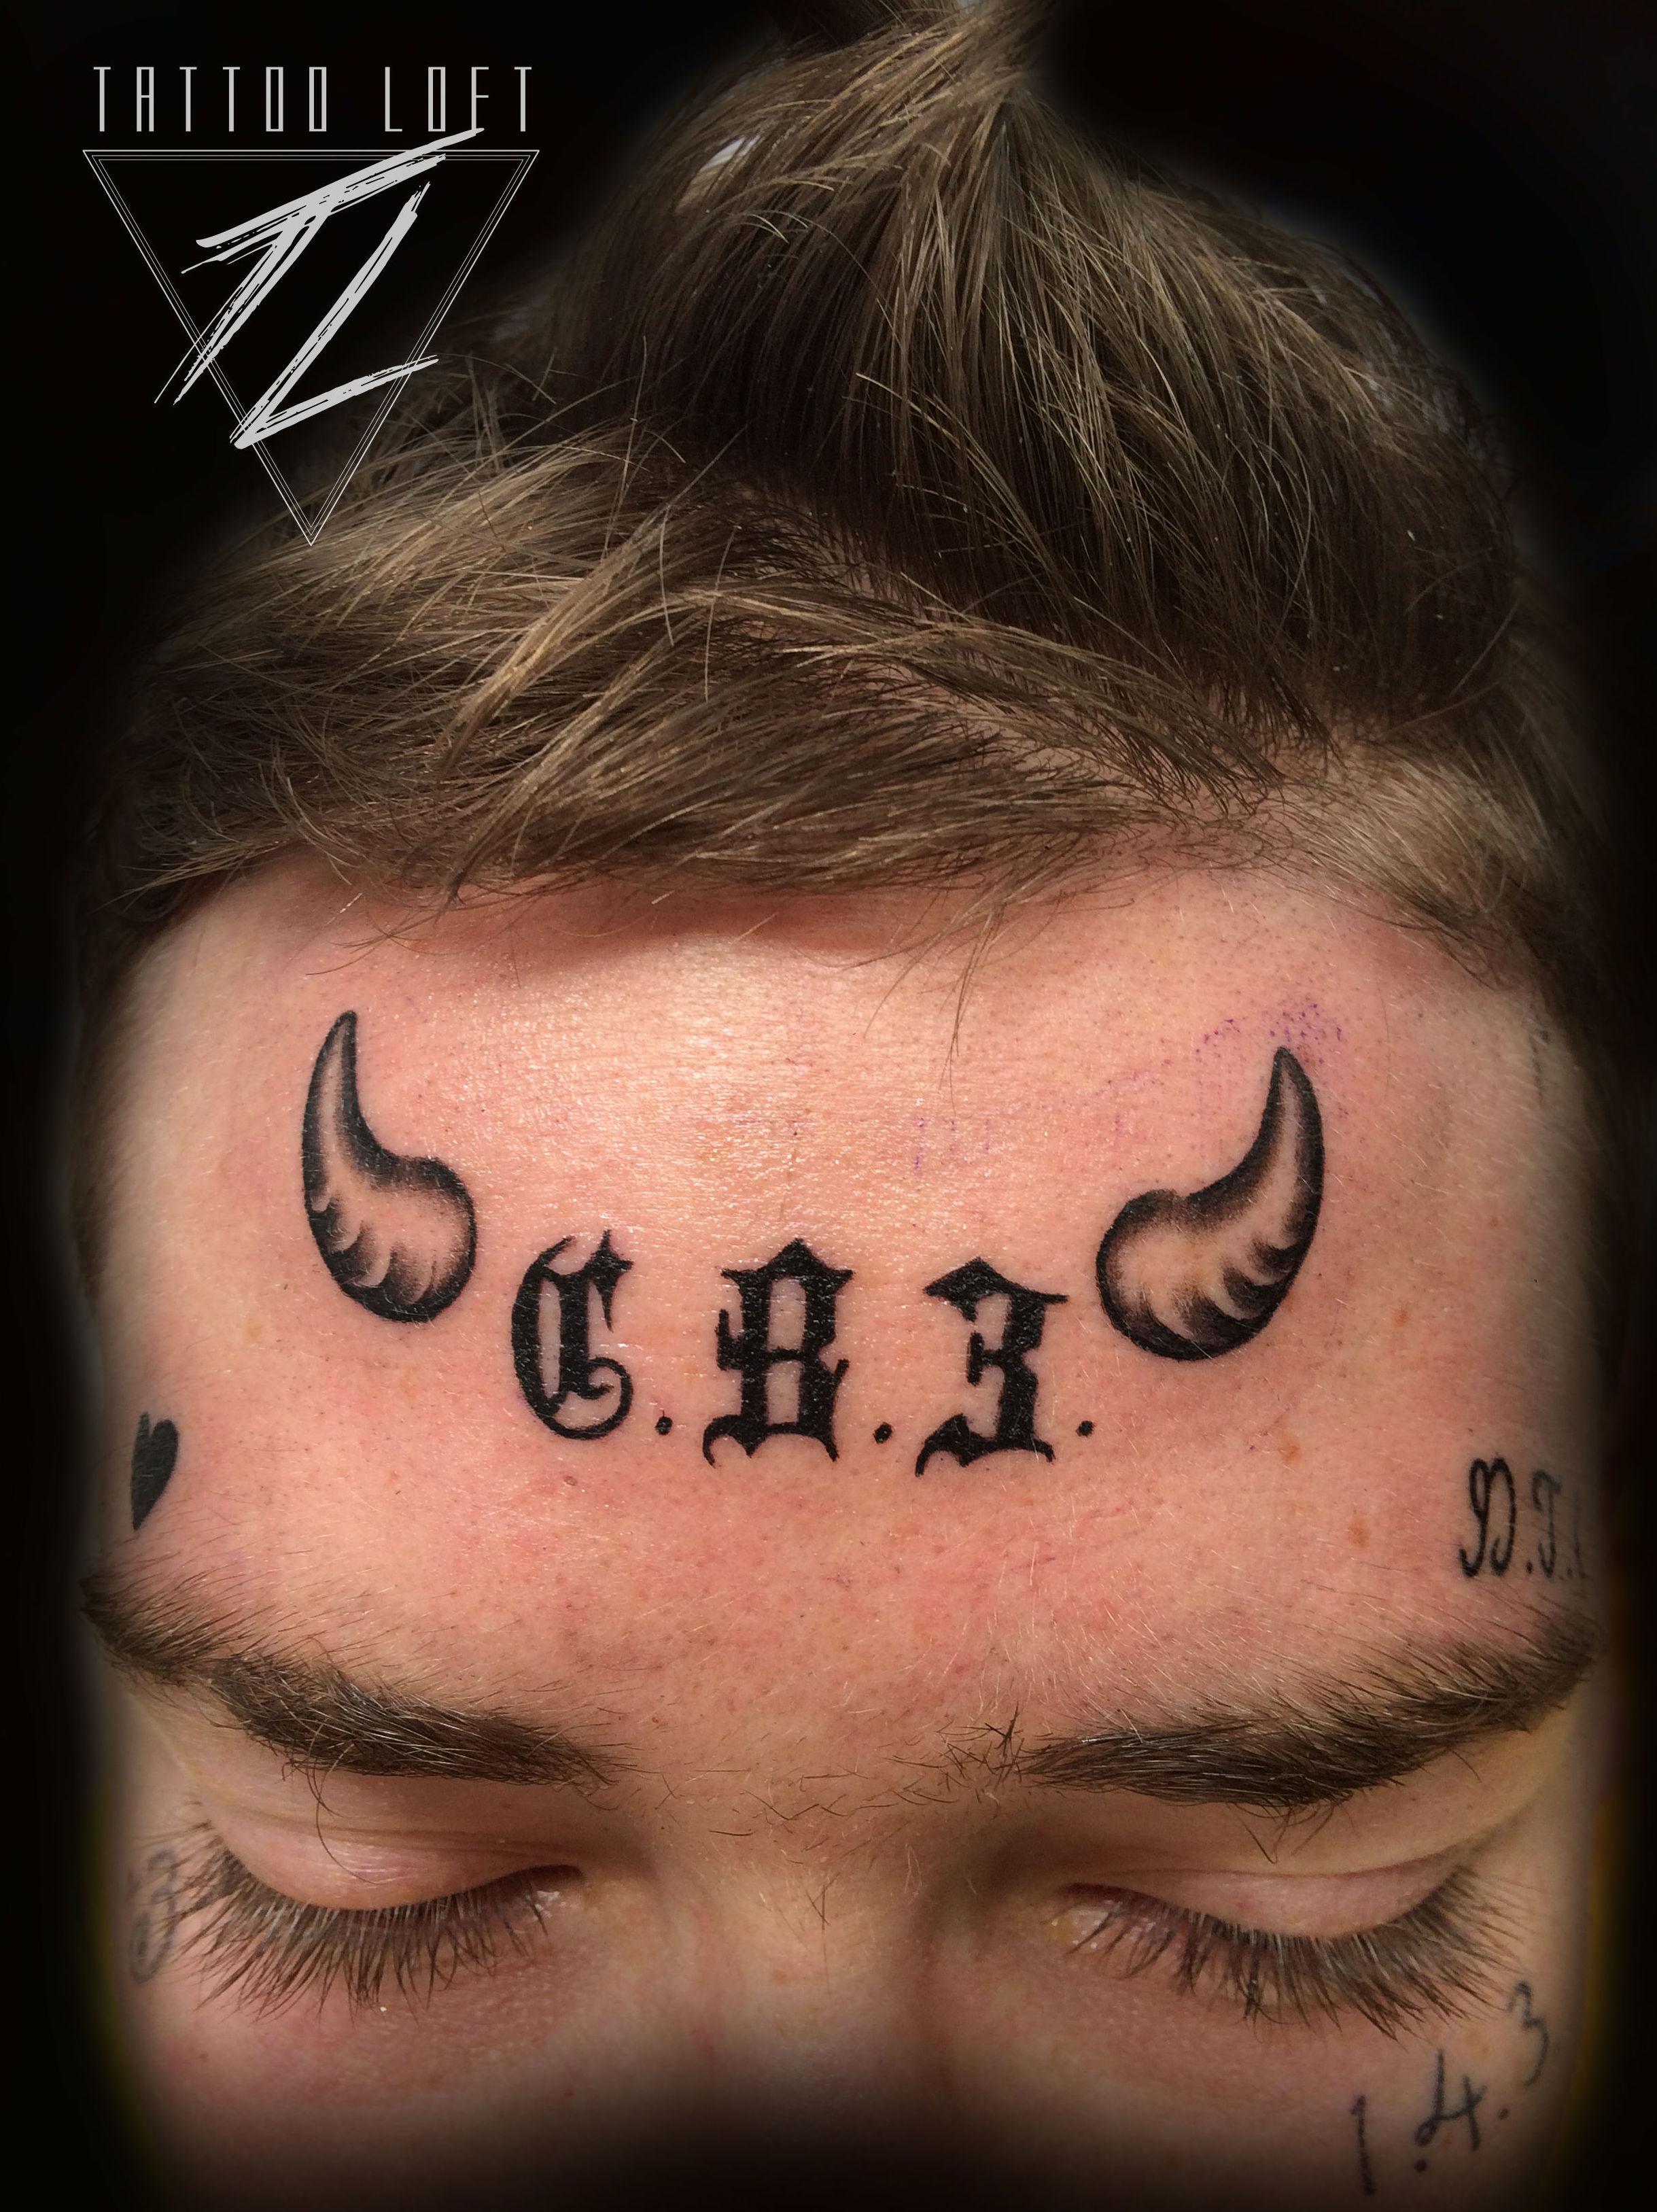 Tatuaje personalizado Carabanchel